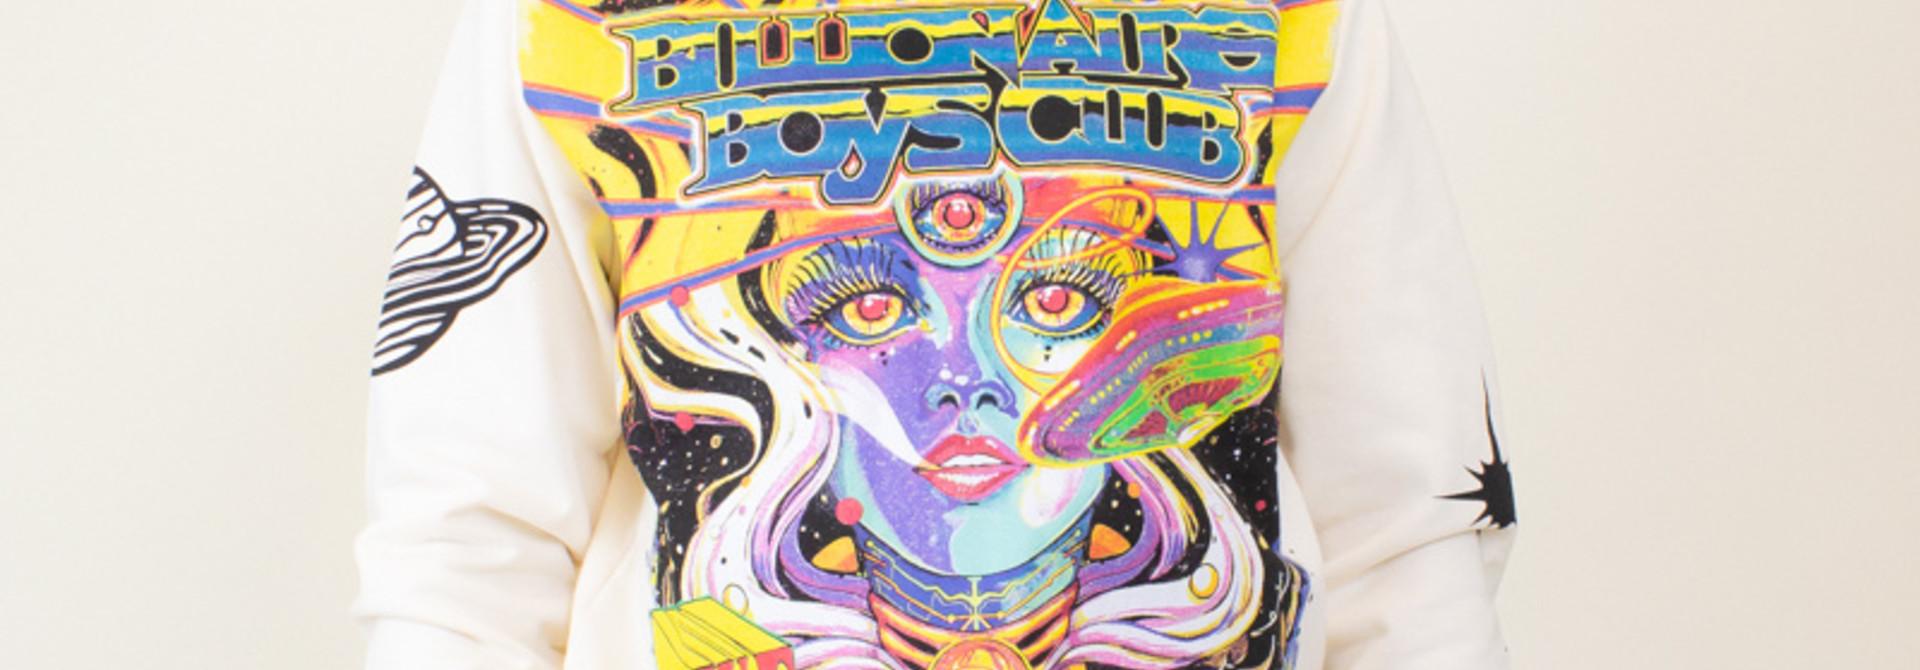 Billionaire Boys Club Celestial Crew - Butter